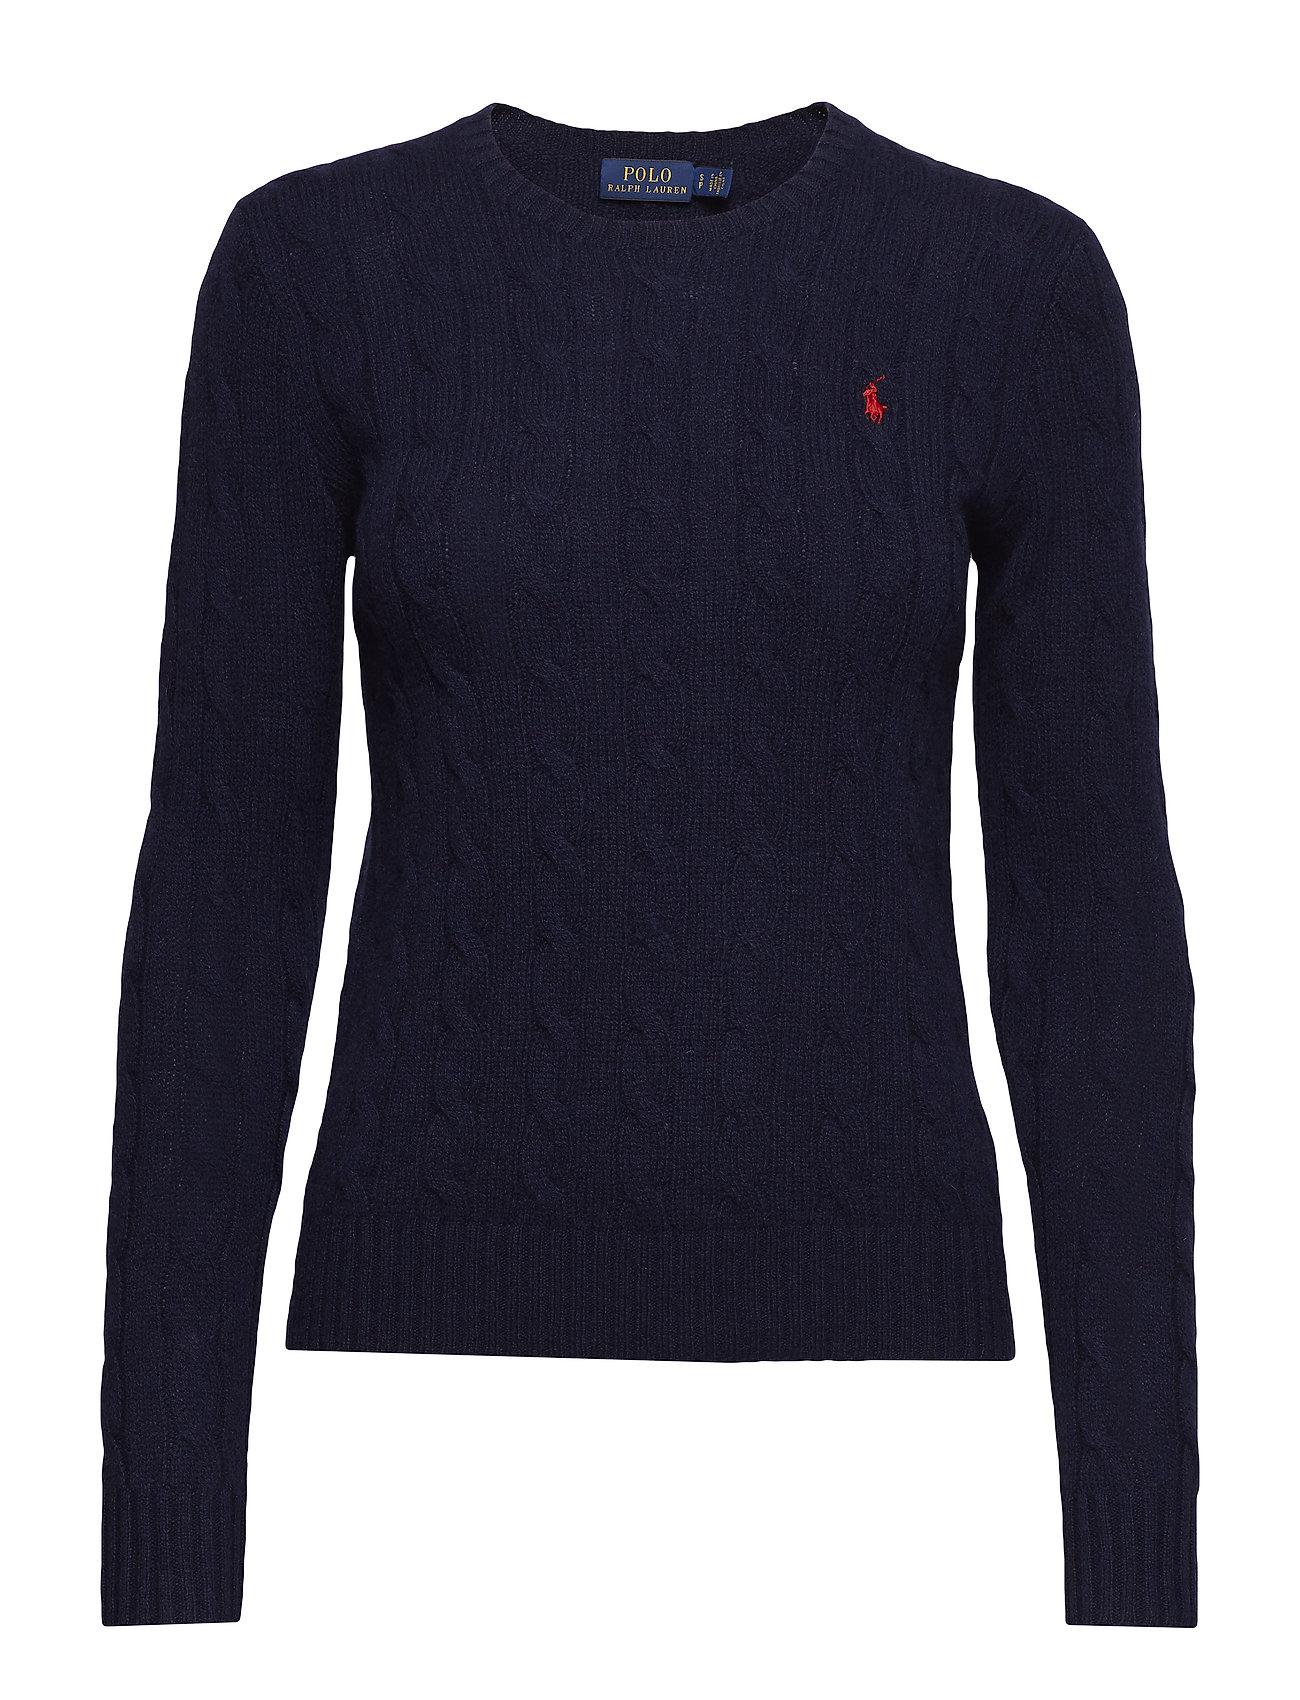 Polo Ralph Lauren Wool-Cashmere Crewneck Sweater - HUNTER NAVY